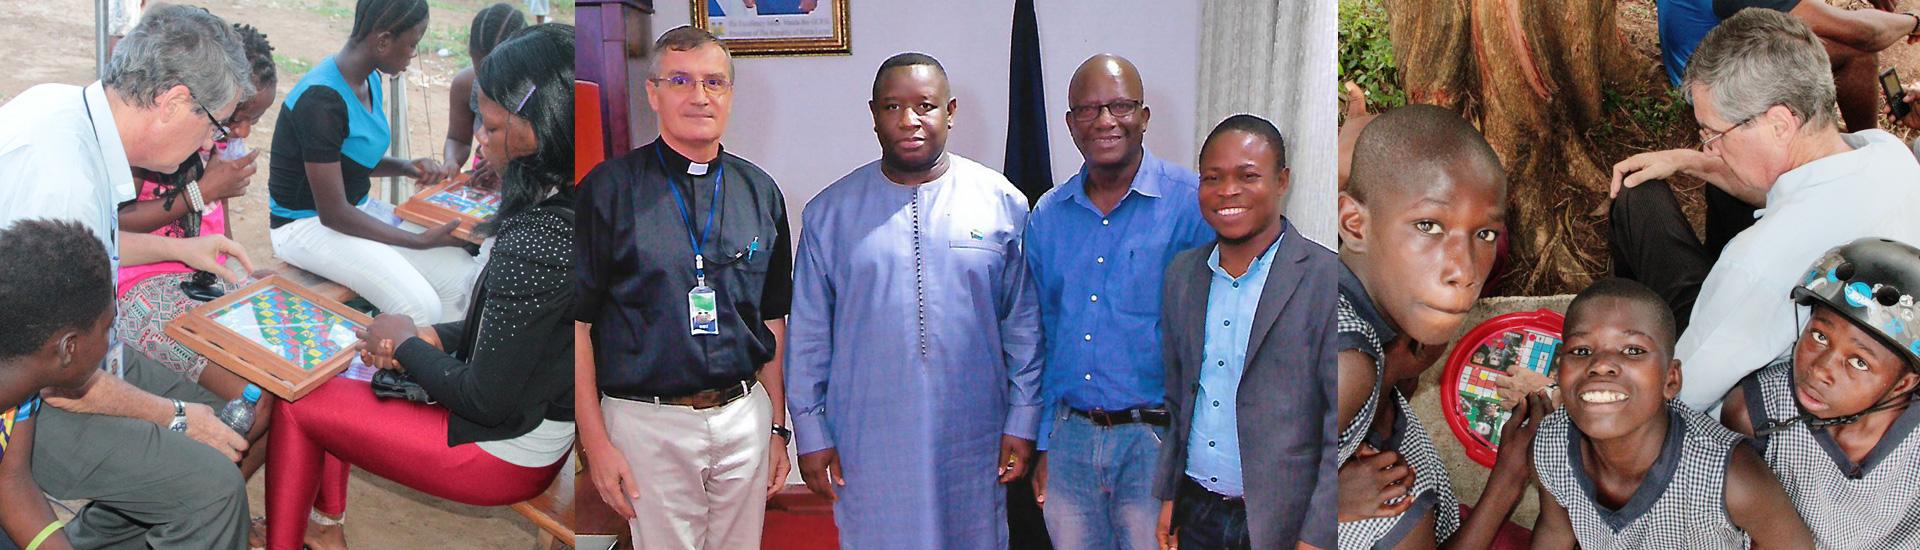 El nuevo presidente de Sierra Leona recibe al director de Don Bosco Fambul